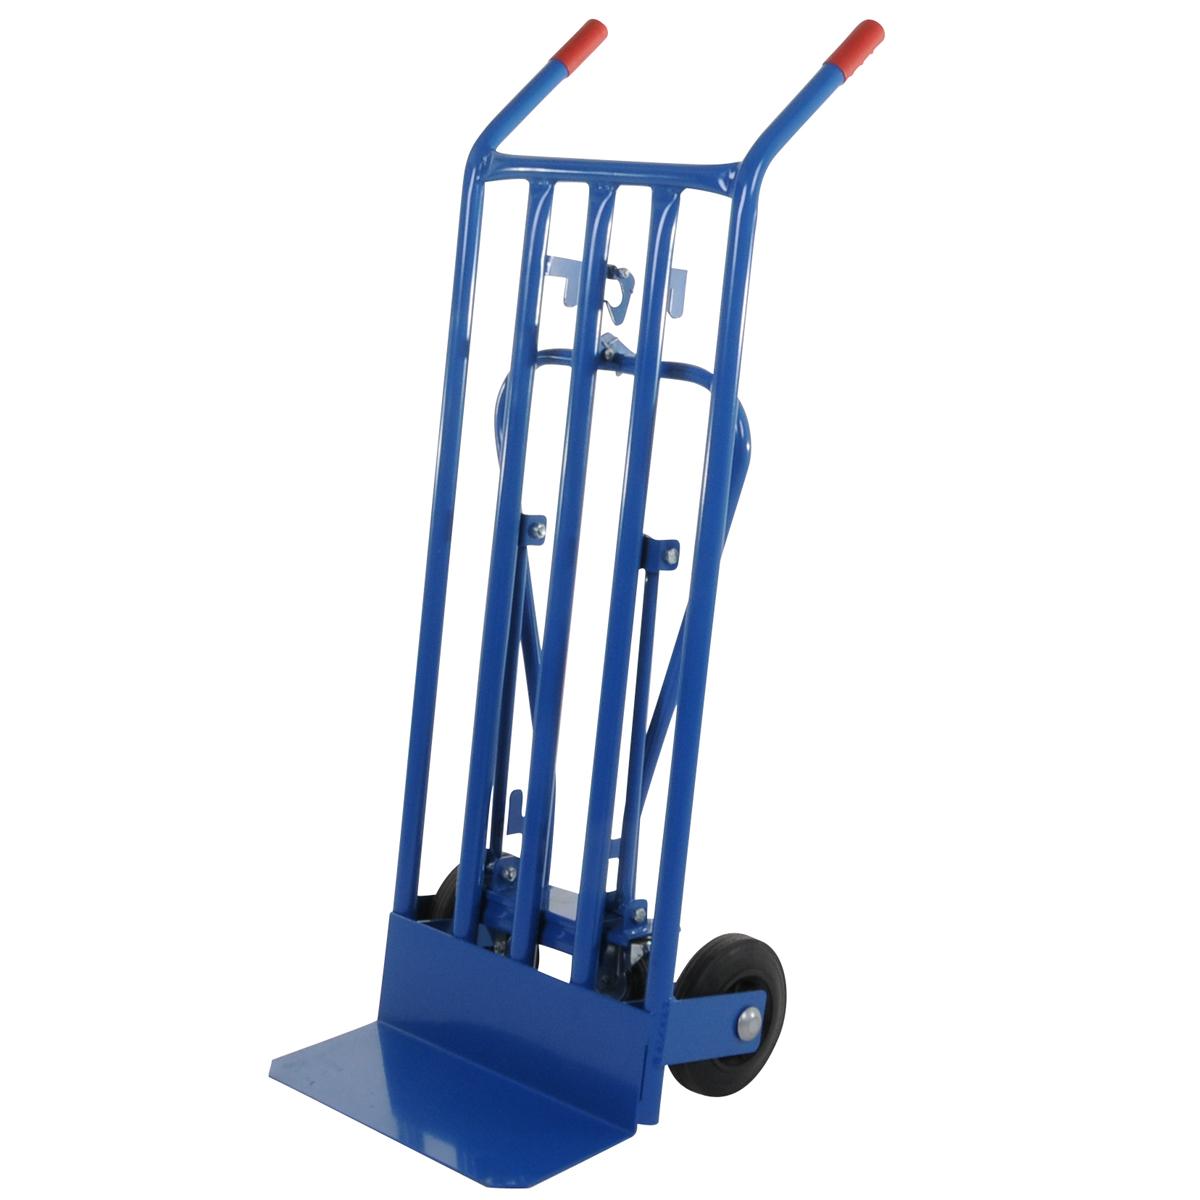 3 in 1 Sack Trolley Multi Truck Platform Barrow Cart Hand ...